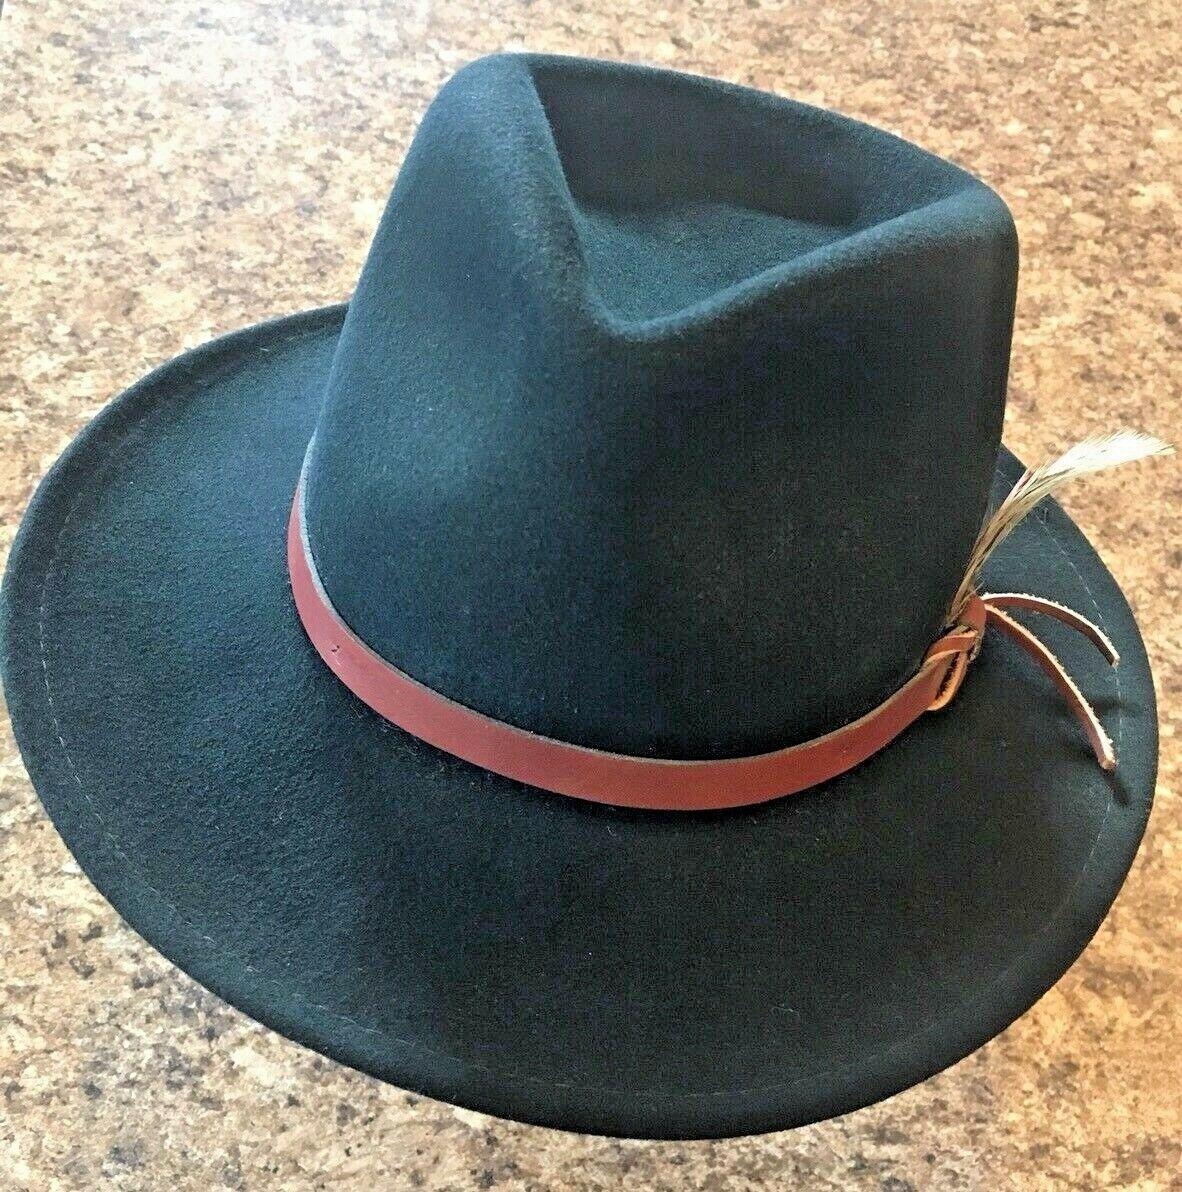 DORFMAN PACIFIC Fedora Black Wool Felt Velvet Hat Feather Sz M Brush Made USA